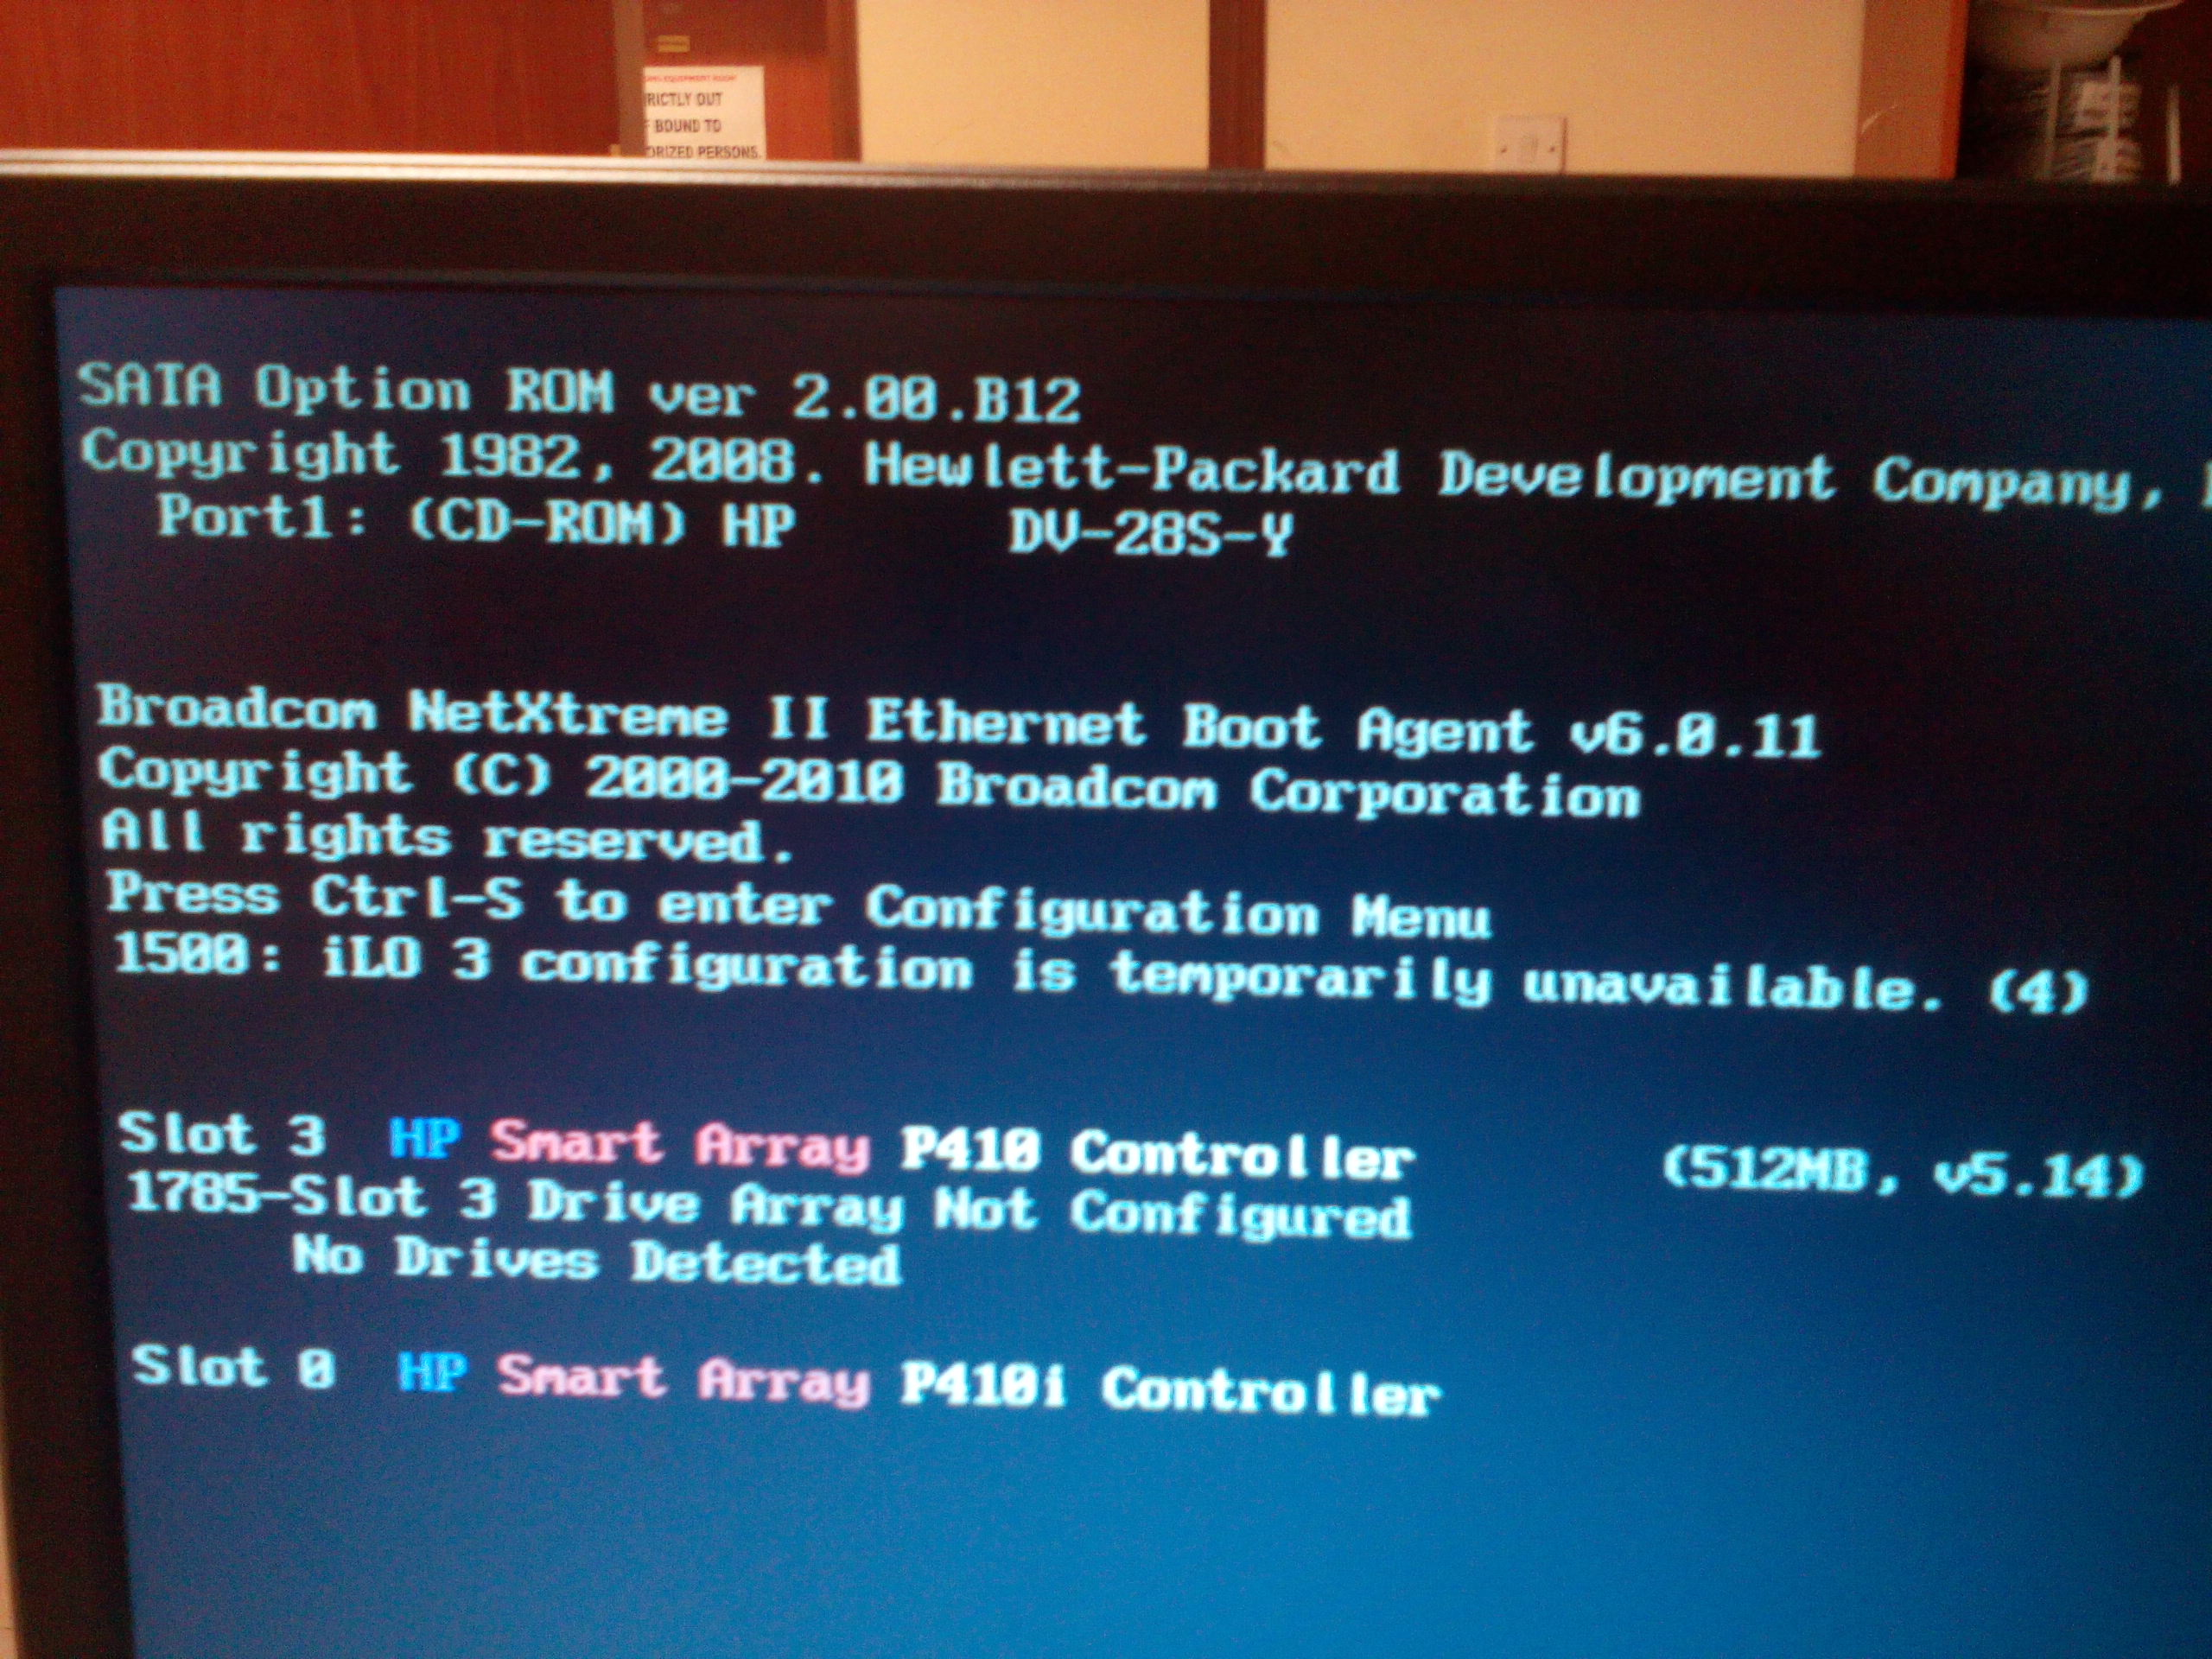 HP ProLiant DL380 G7 Servers - Hard Drive(s) not B    - Hewlett